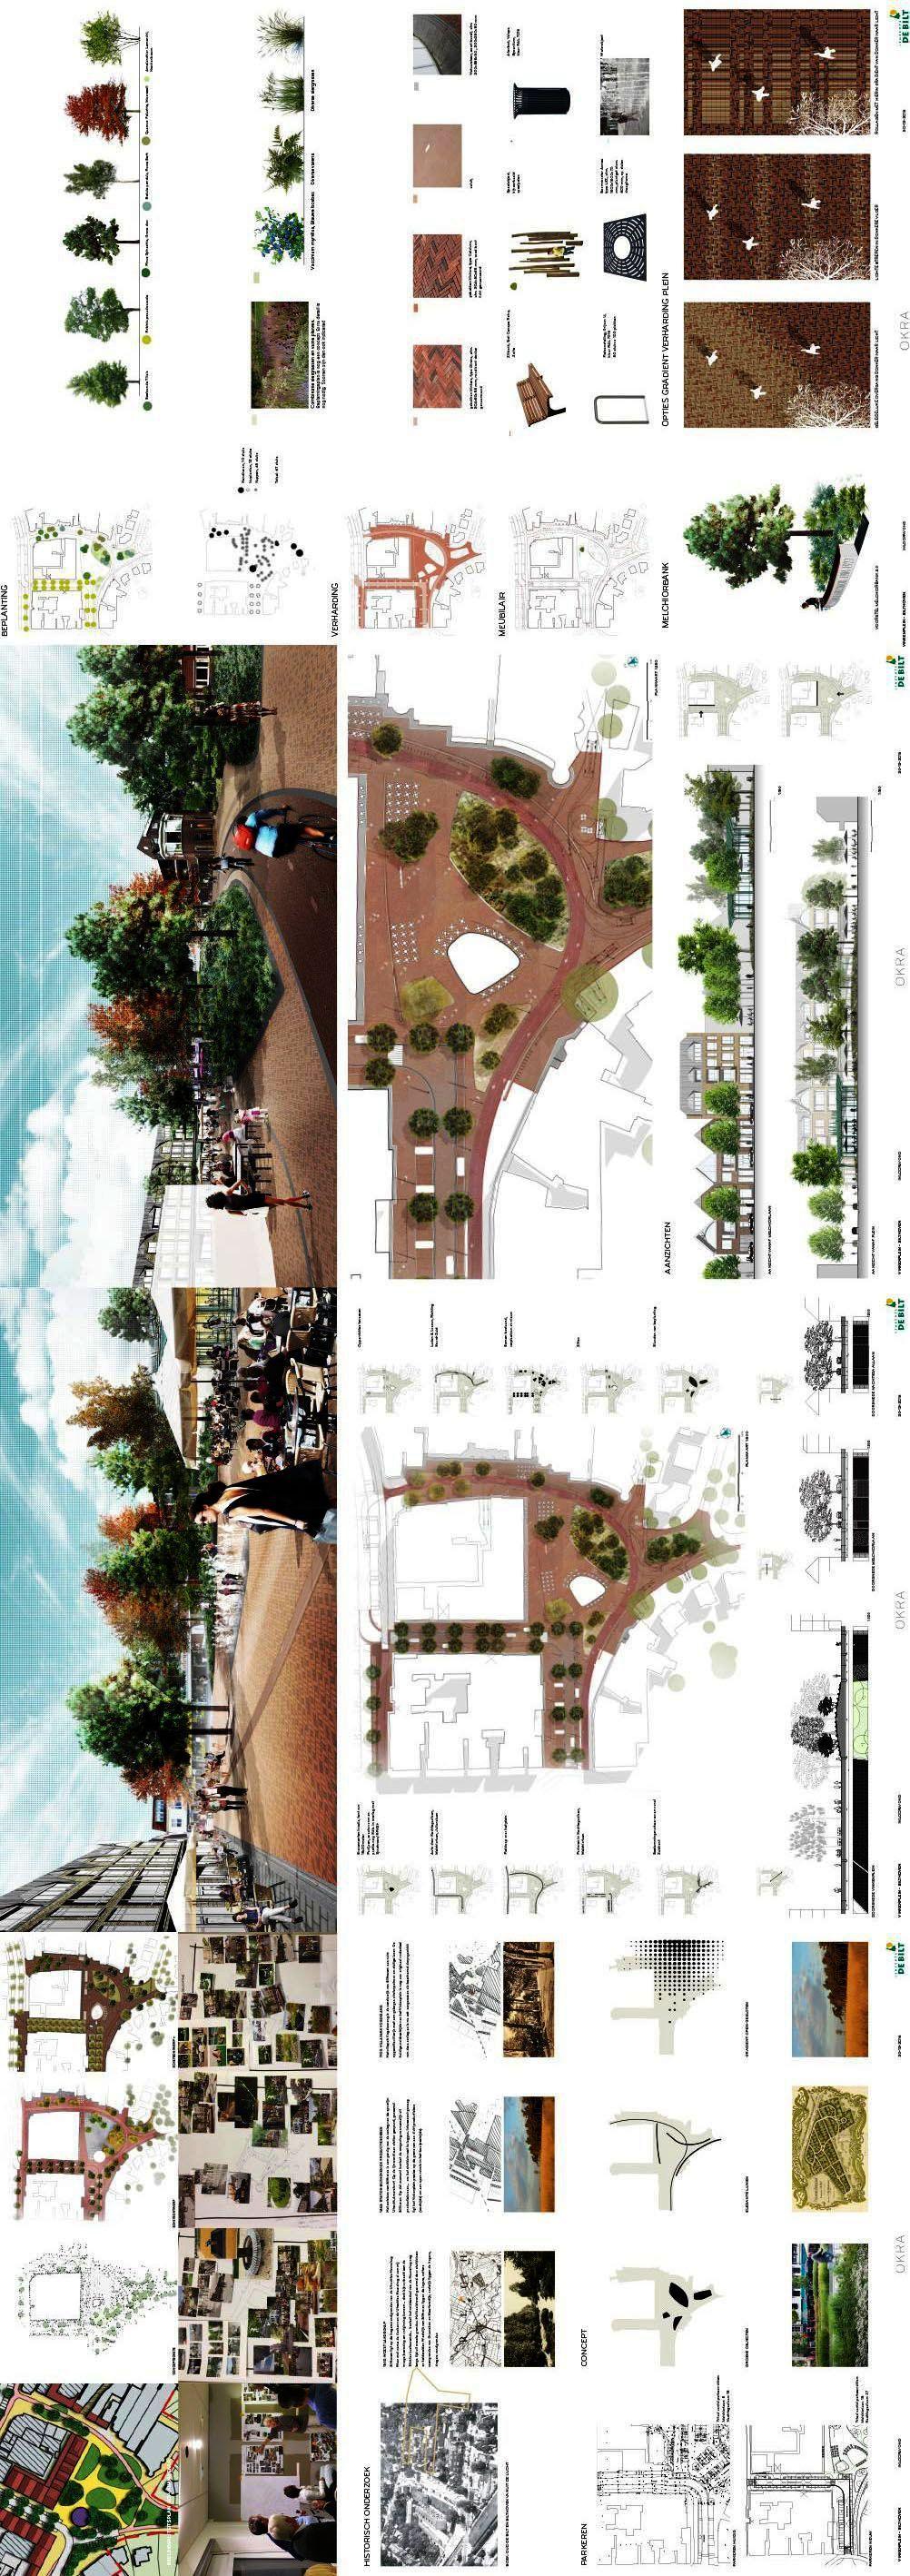 Landscape Architect Salary Dallas Landscape Architecture Design M Landscape Architecture Presentation Landscape Architecture Design Architecture Presentation